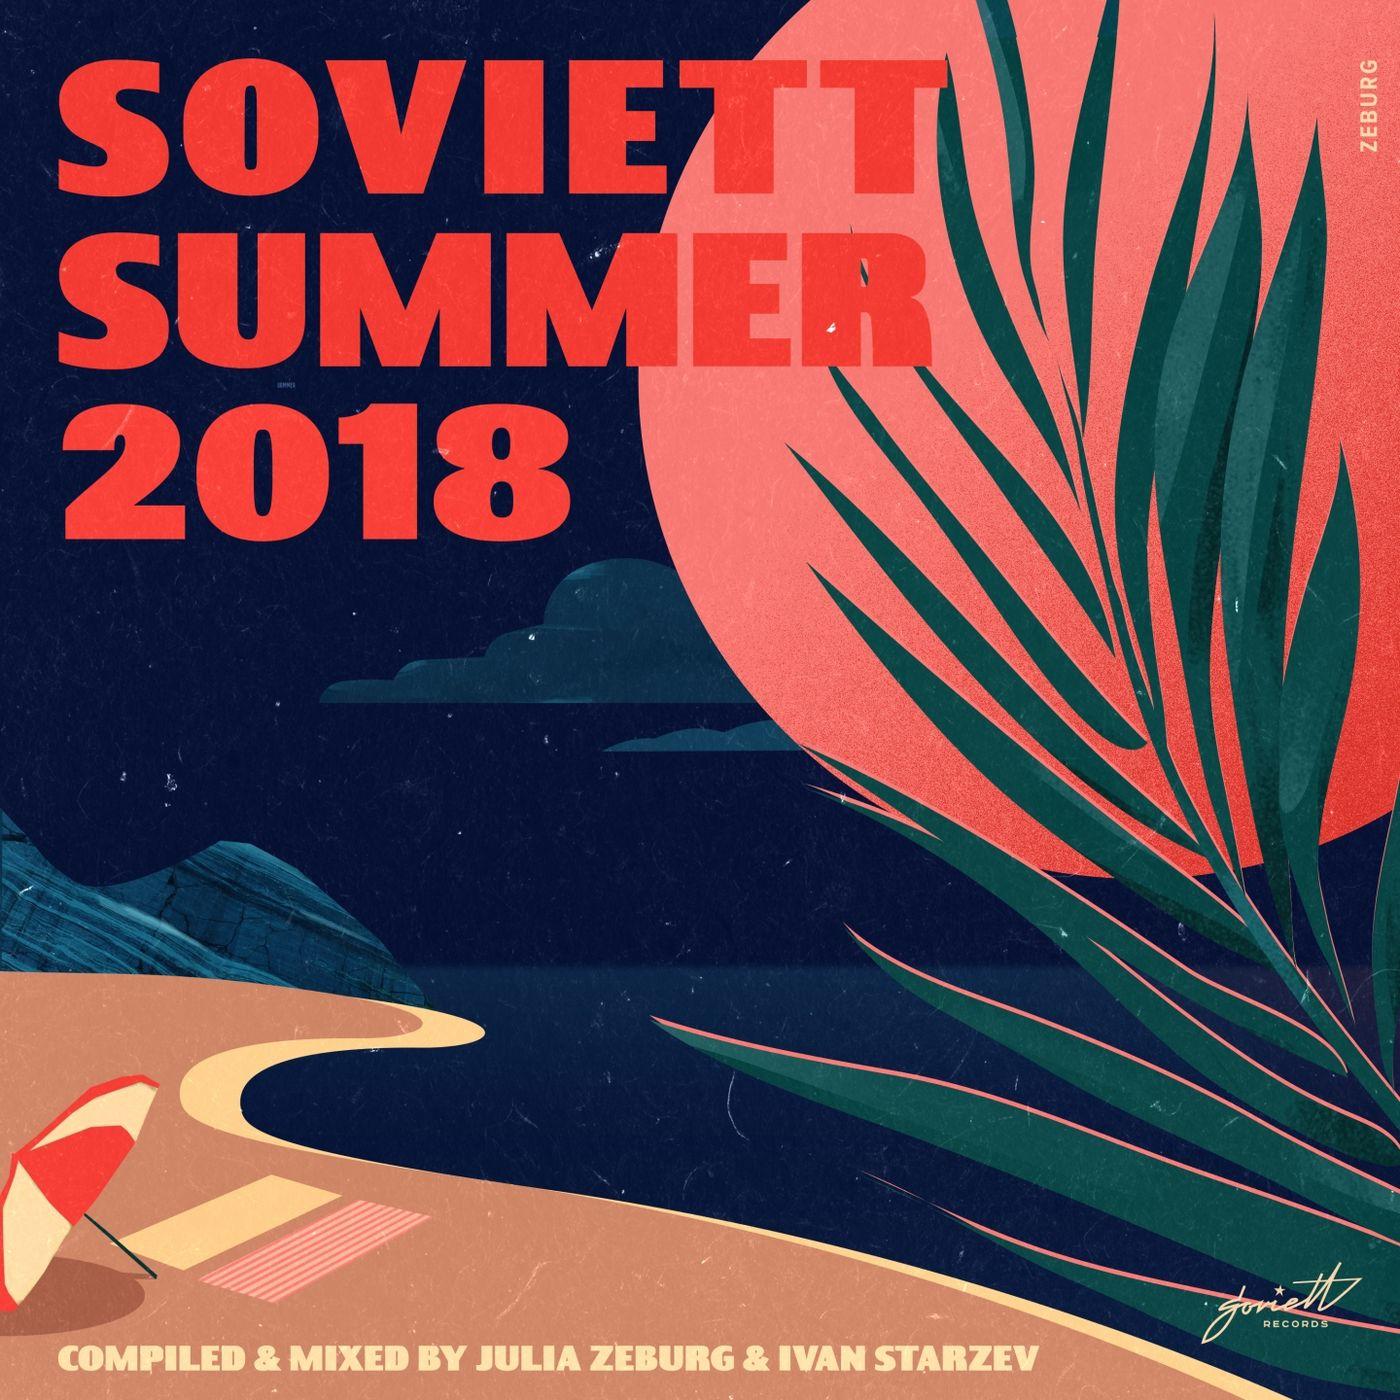 VA - Soviett Summer 2018  (Compiled & Mixed by Julia Zeburg & Ivan Starzev)